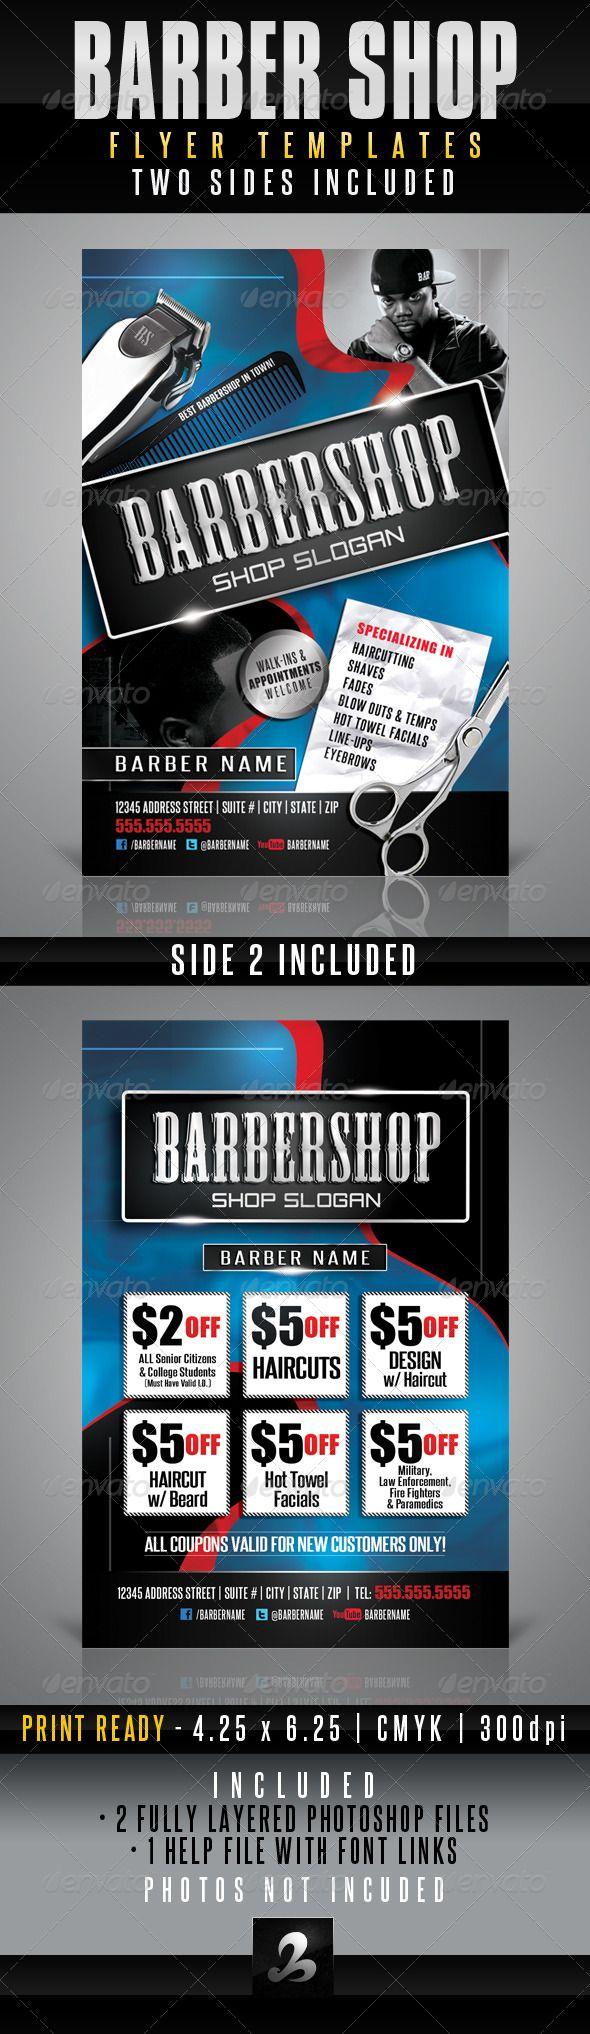 Barbershop Flyer Templates Pinterest – Coupon Flyer Template